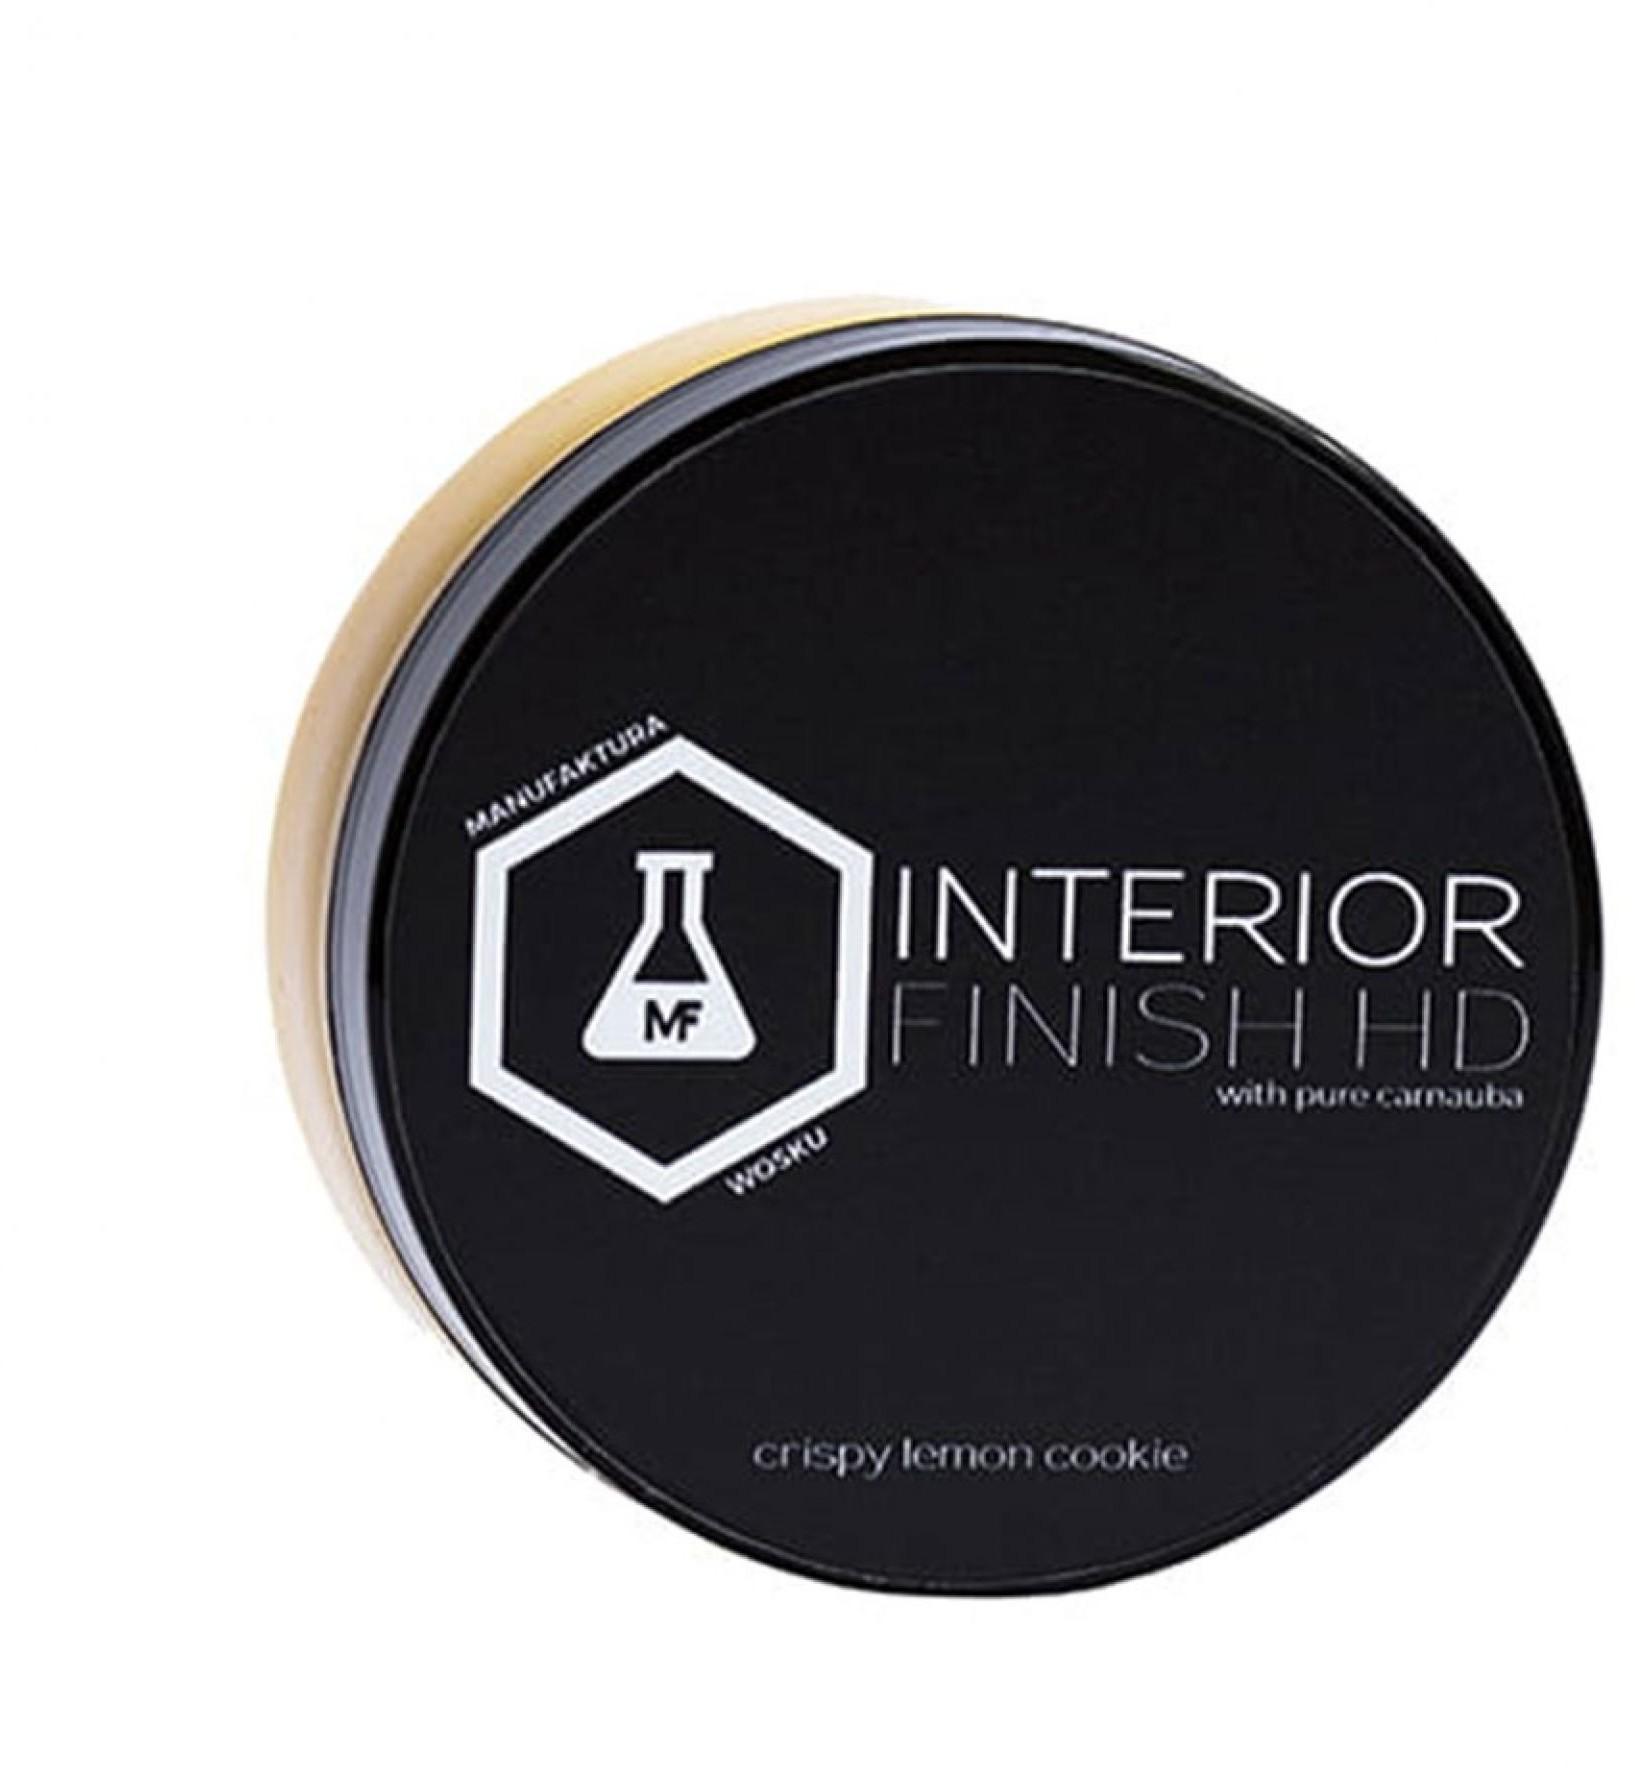 Manufaktura wosku Interior Finish HD Manufaktura wosku 75ml - Crispy Lemon Cookie - wosk do dekorów